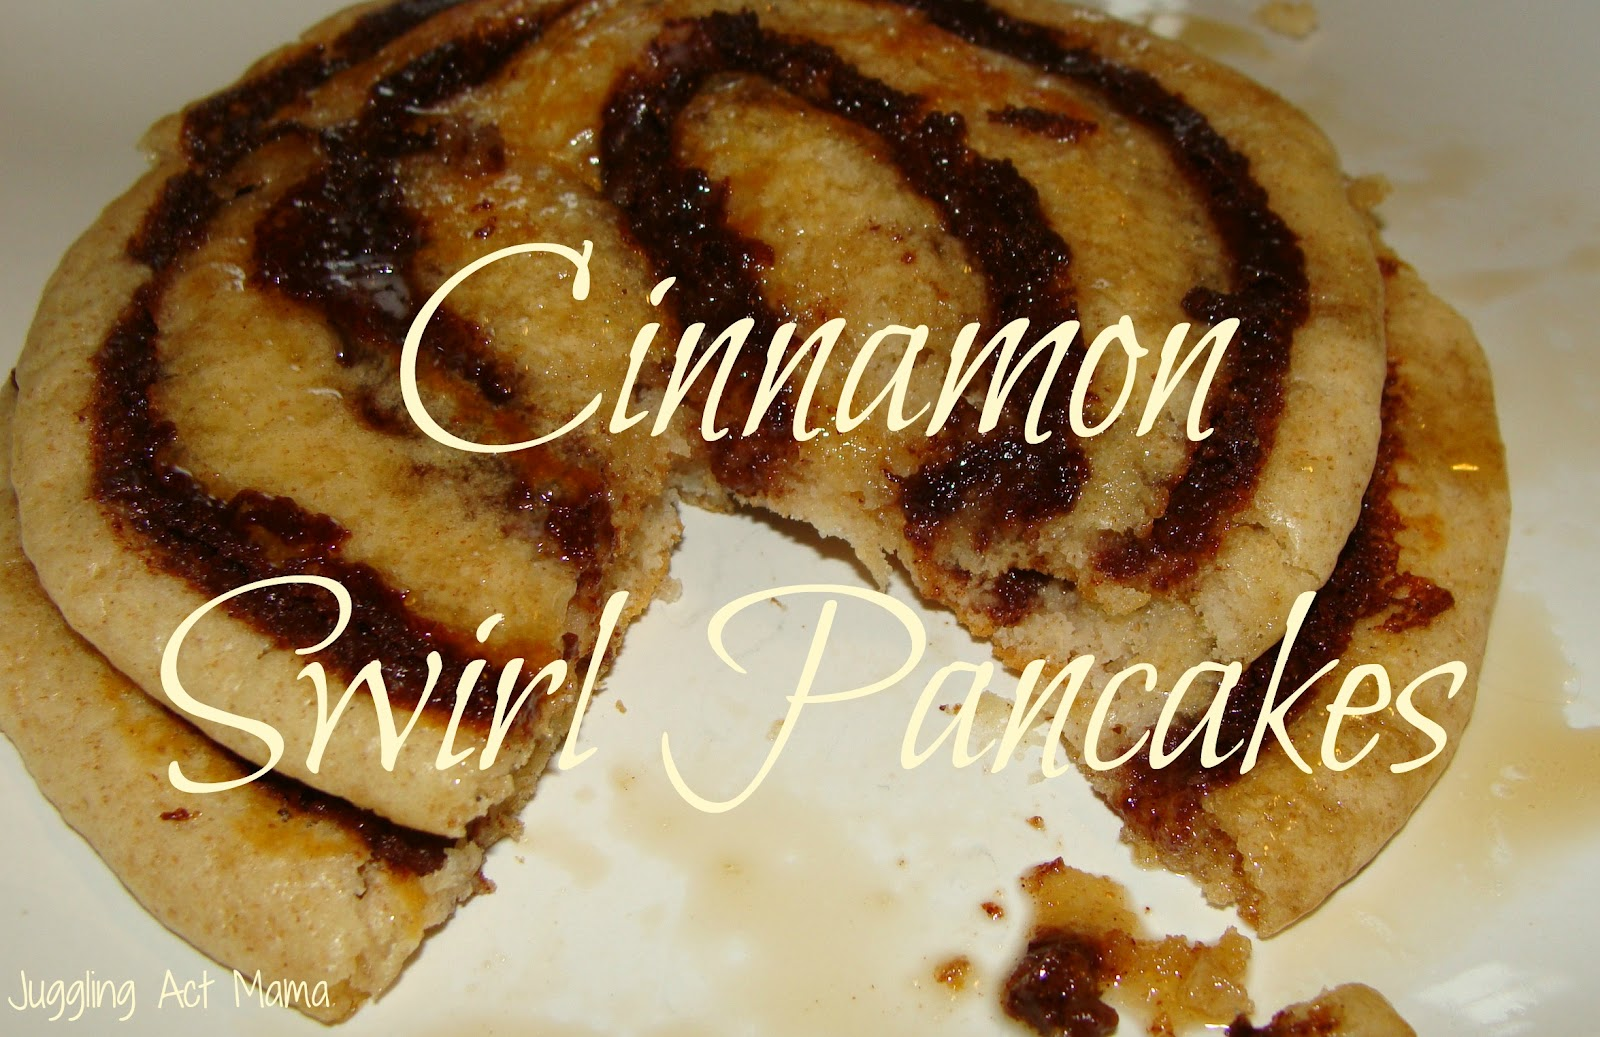 Cinnamon Swirl Pancakes - Juggling Act Mama